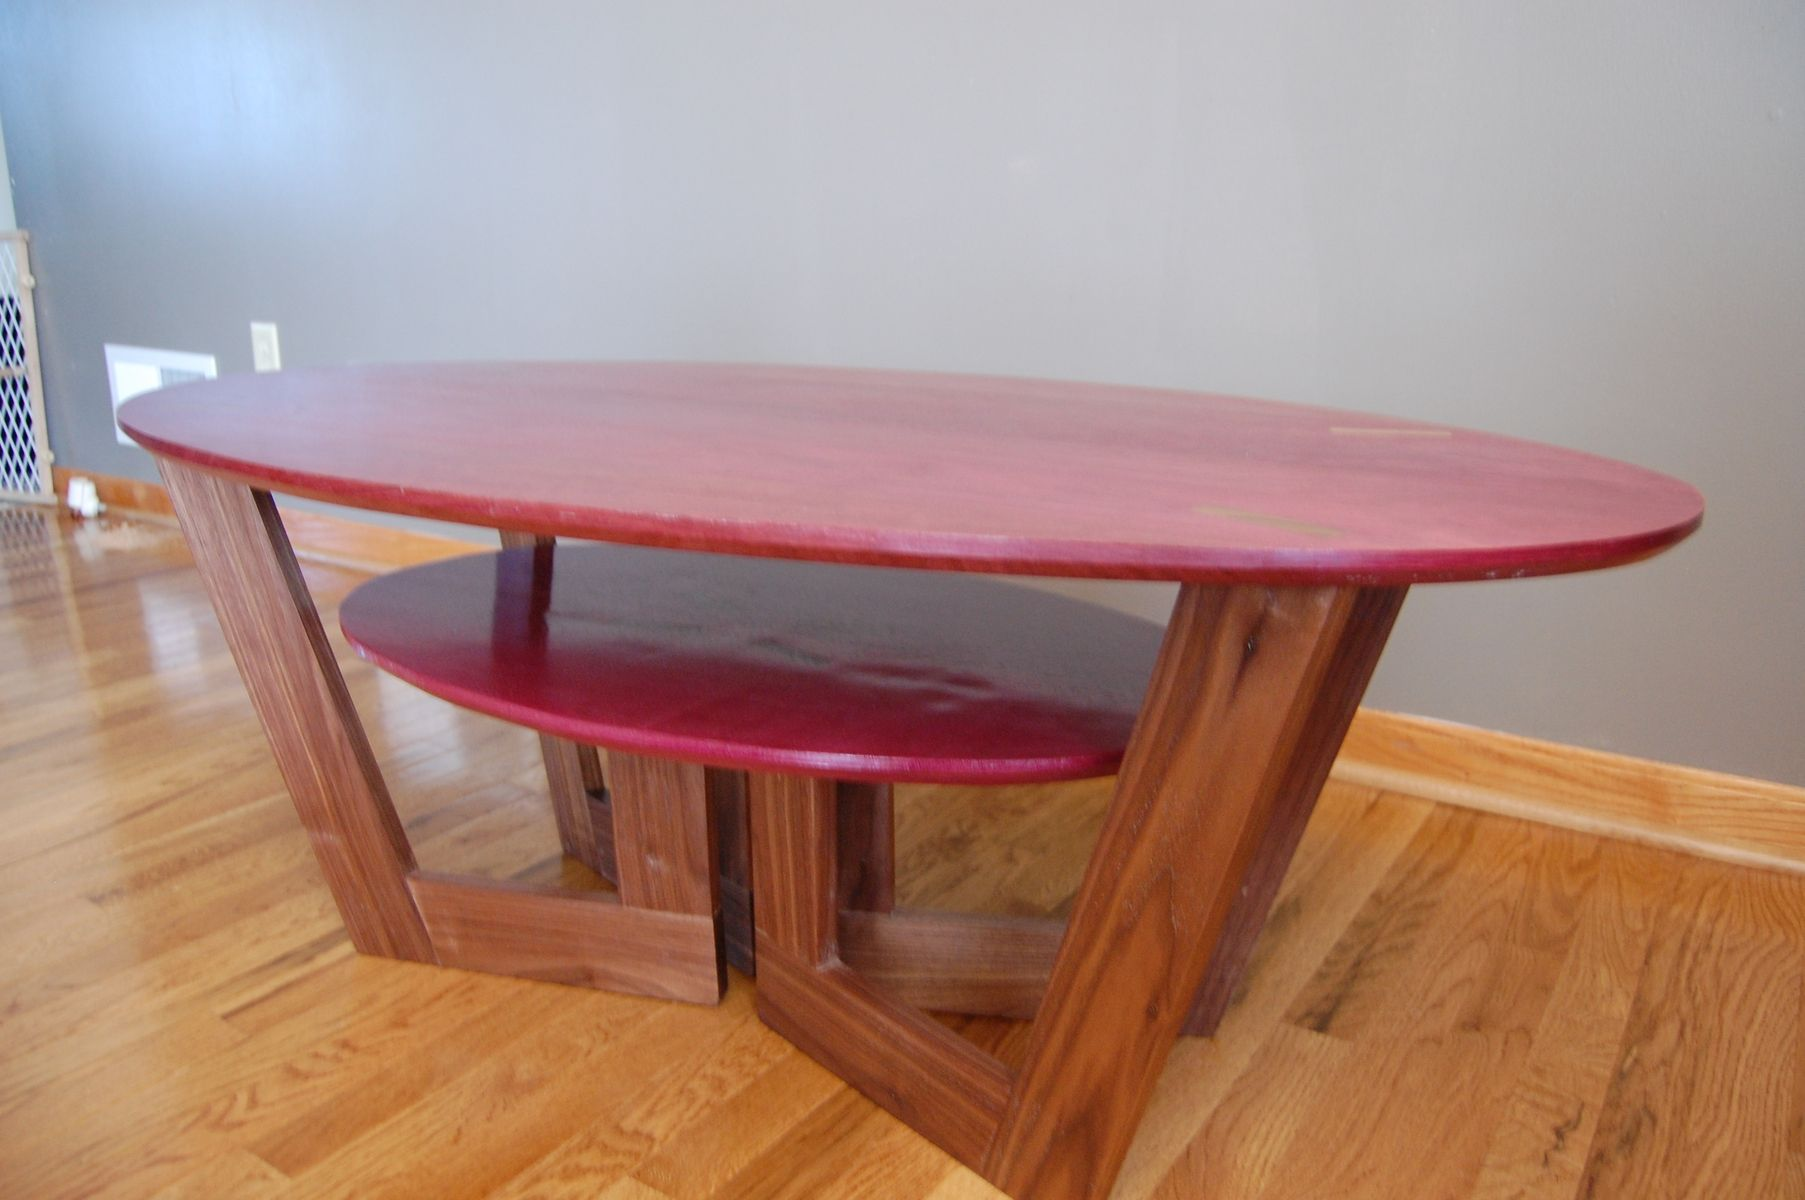 Custom Made Purpleheart Coffee Table. Custom Purpleheart Coffee Table by Clark Mcgill Furniture